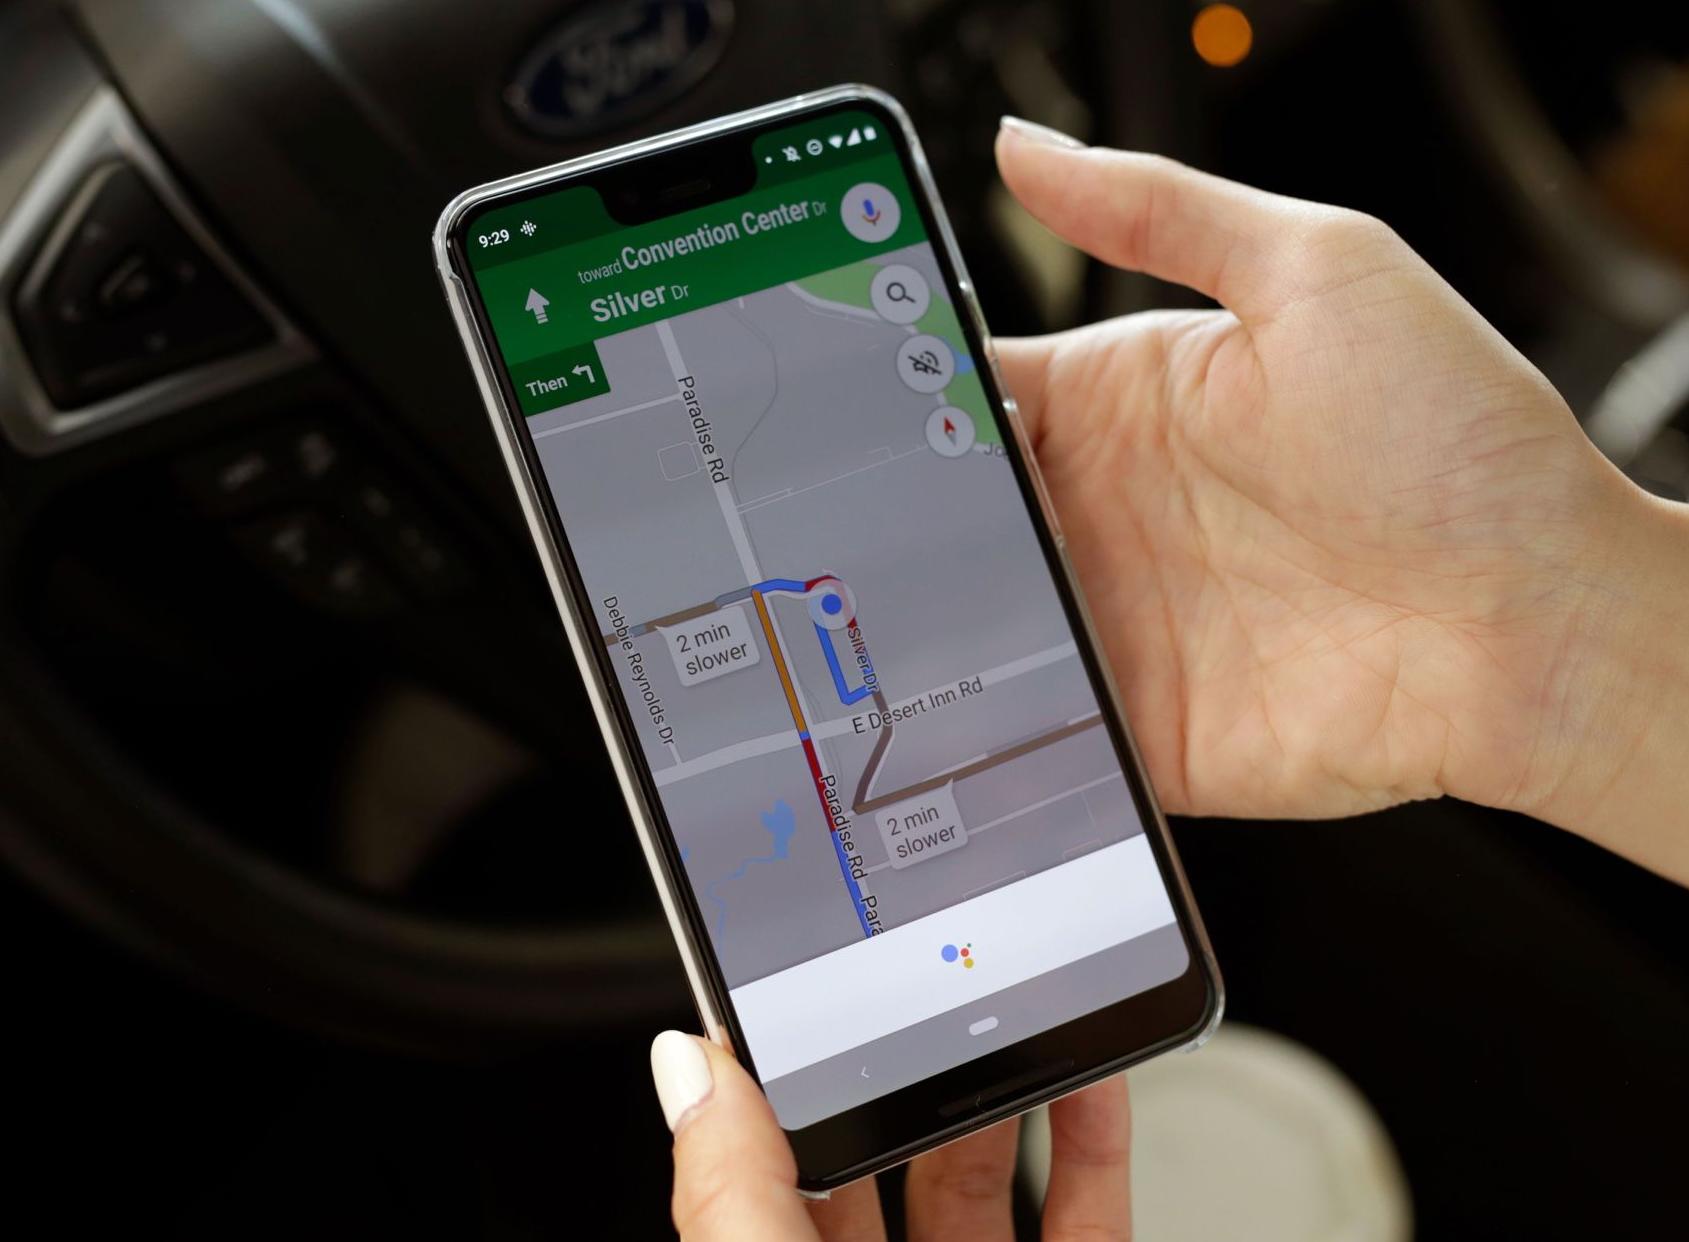 Google Assistant Google Maps apps